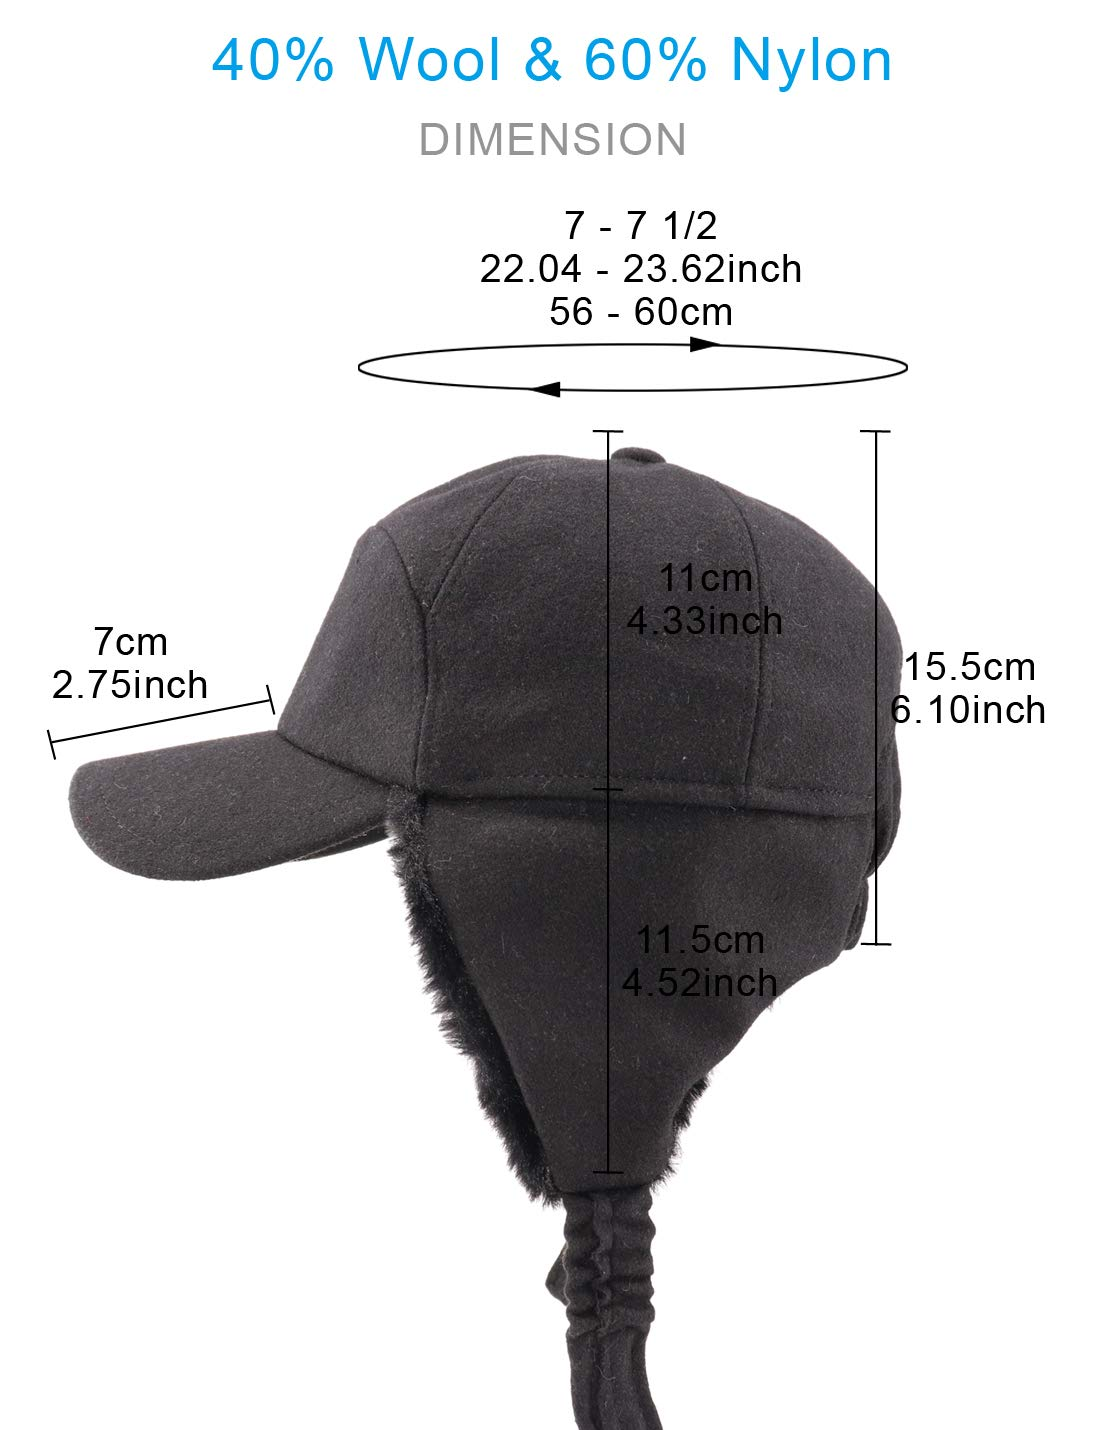 34e62f64325 Gisdanchz 7-7 1  2 Wool Baseball Hat with Visor and Ear Flaps Winter Warm  Cap for Men Women